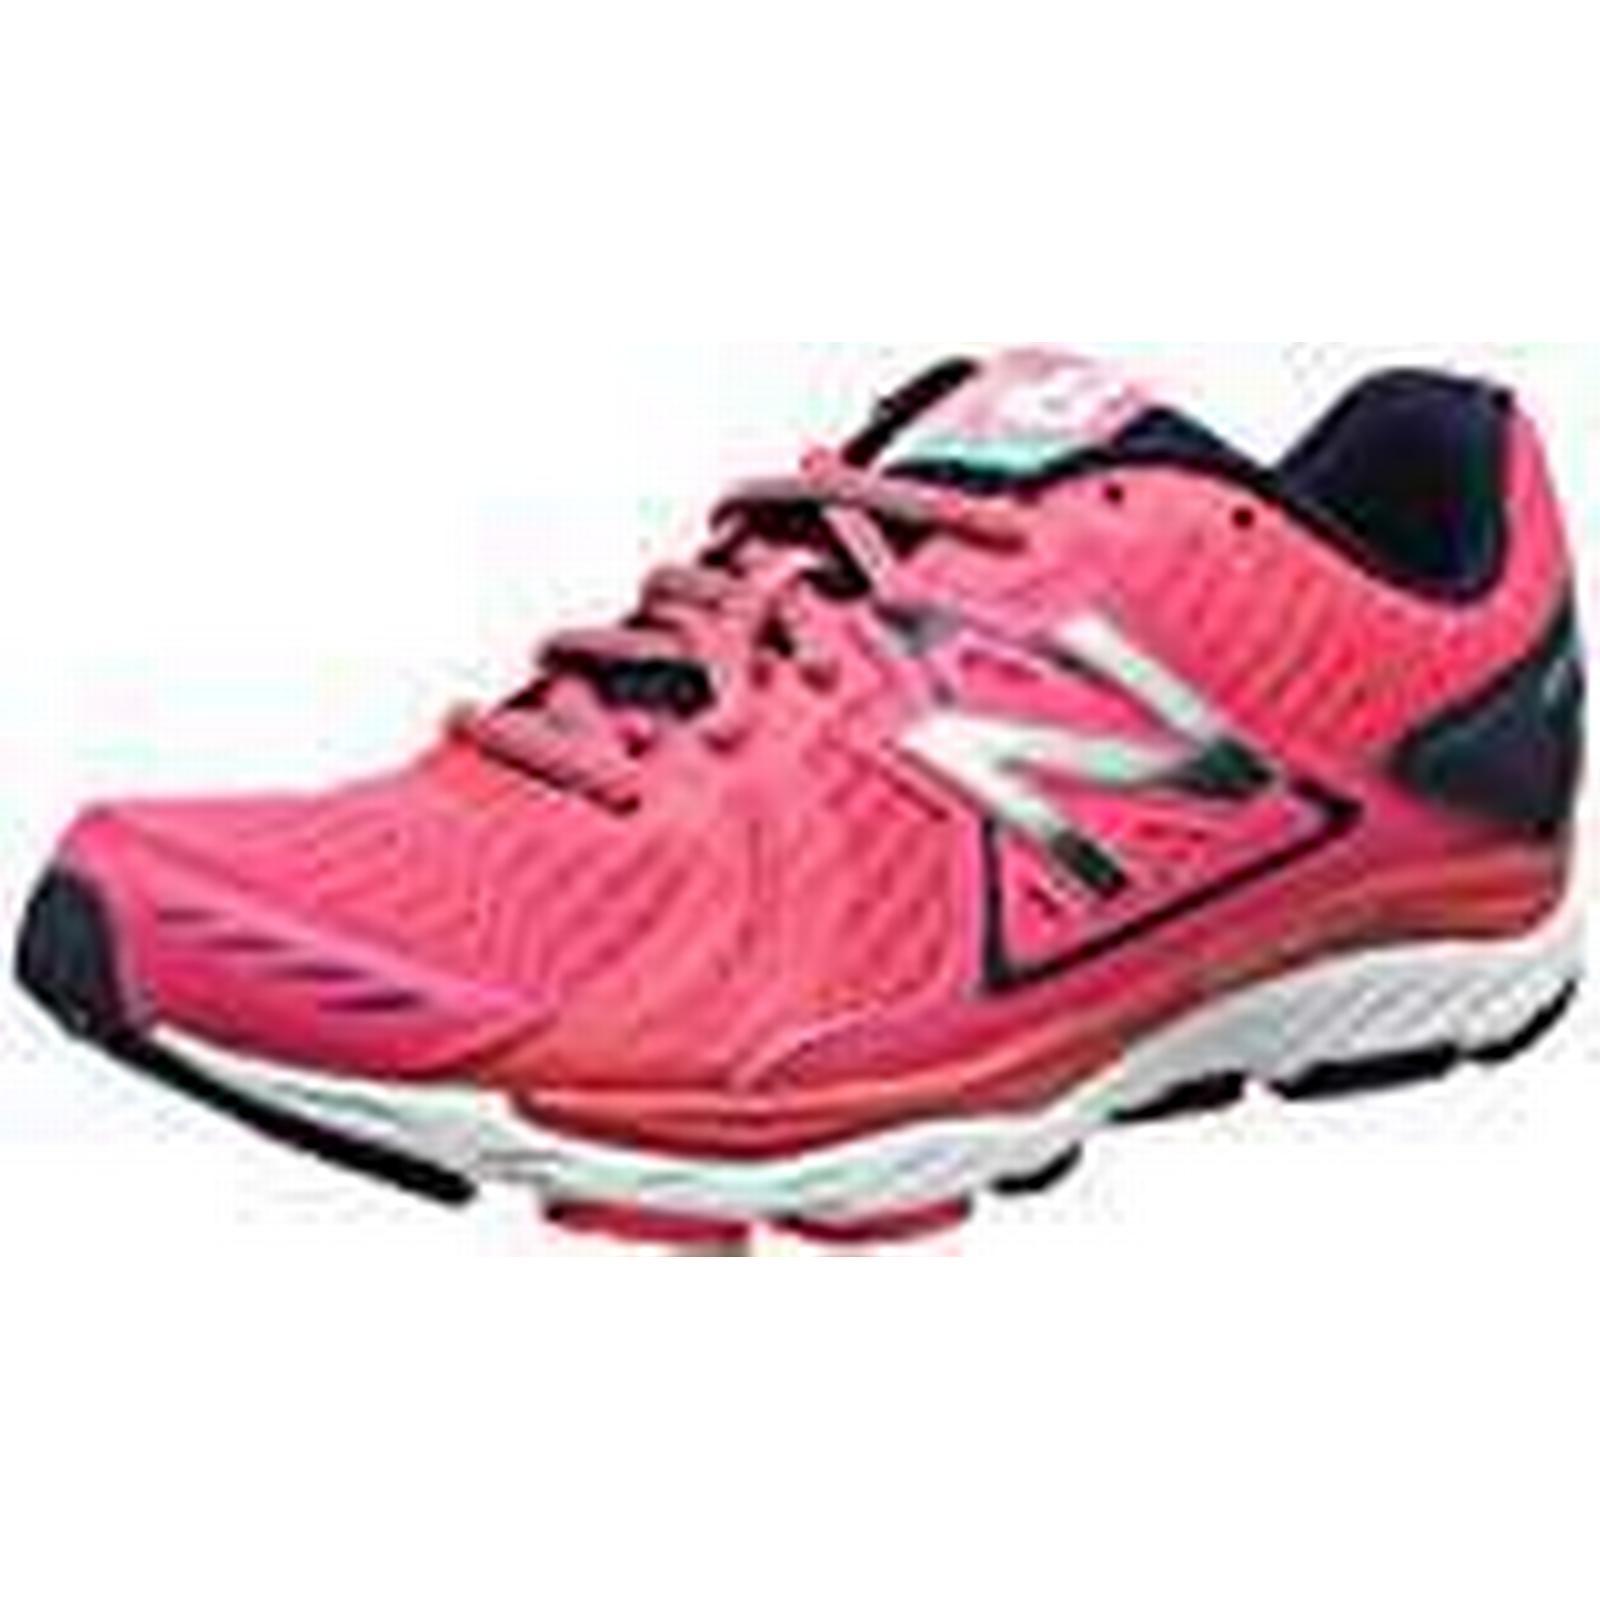 New Balance Women's 670v5 41 Fitness Shoes, (Pink), 7.5 UK 41 670v5 EU 0bde89